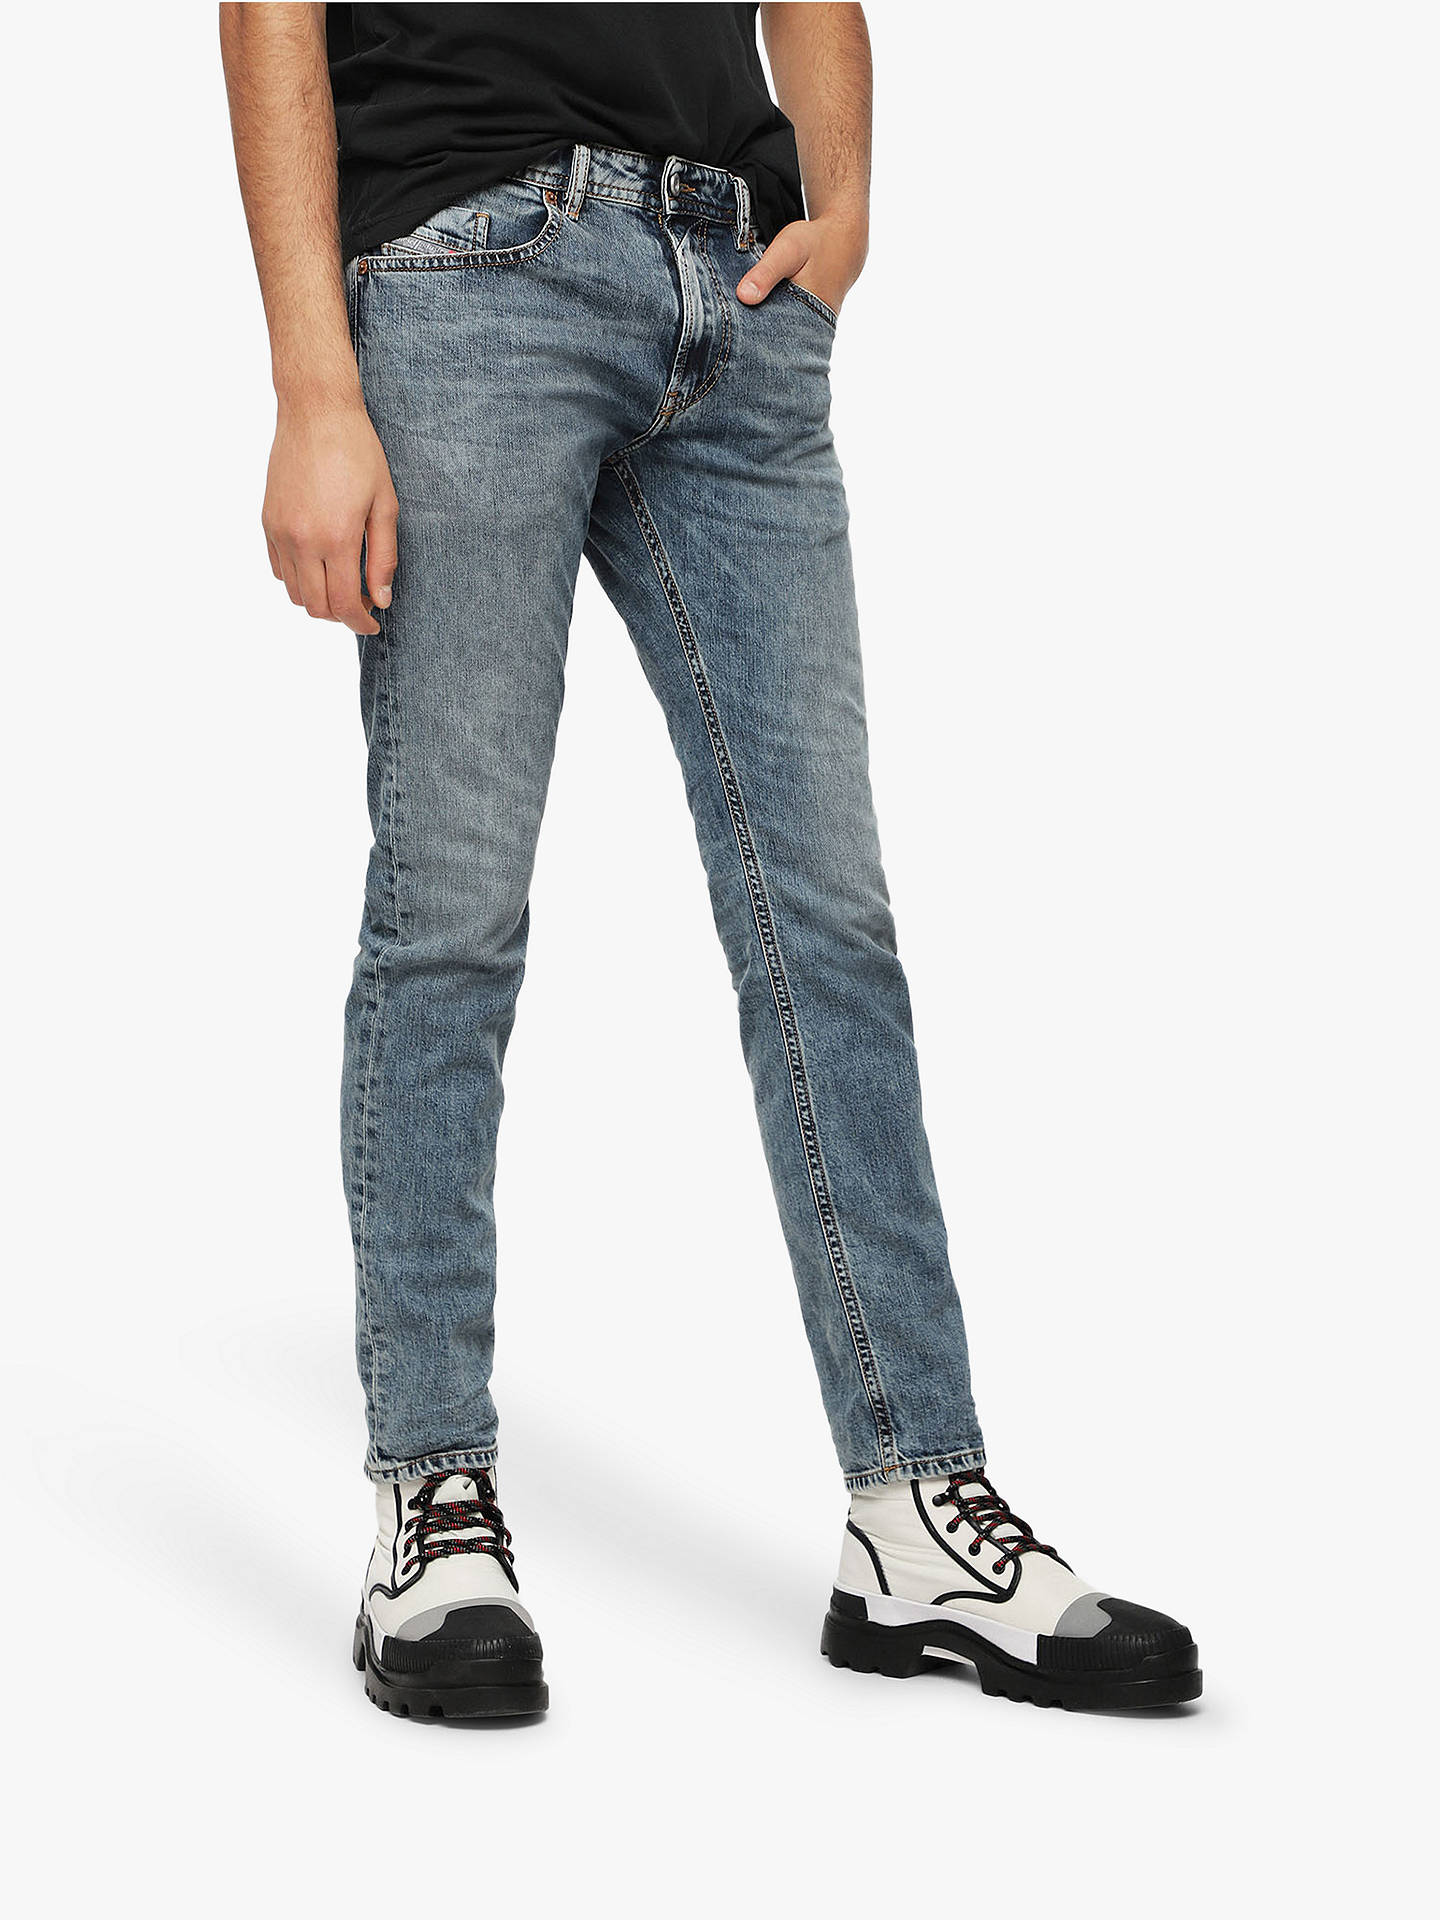 78976d092f2 Buy Diesel Thommer Skinny Fit Stretch Jeans, Blue, 30R Online at  johnlewis.com ...